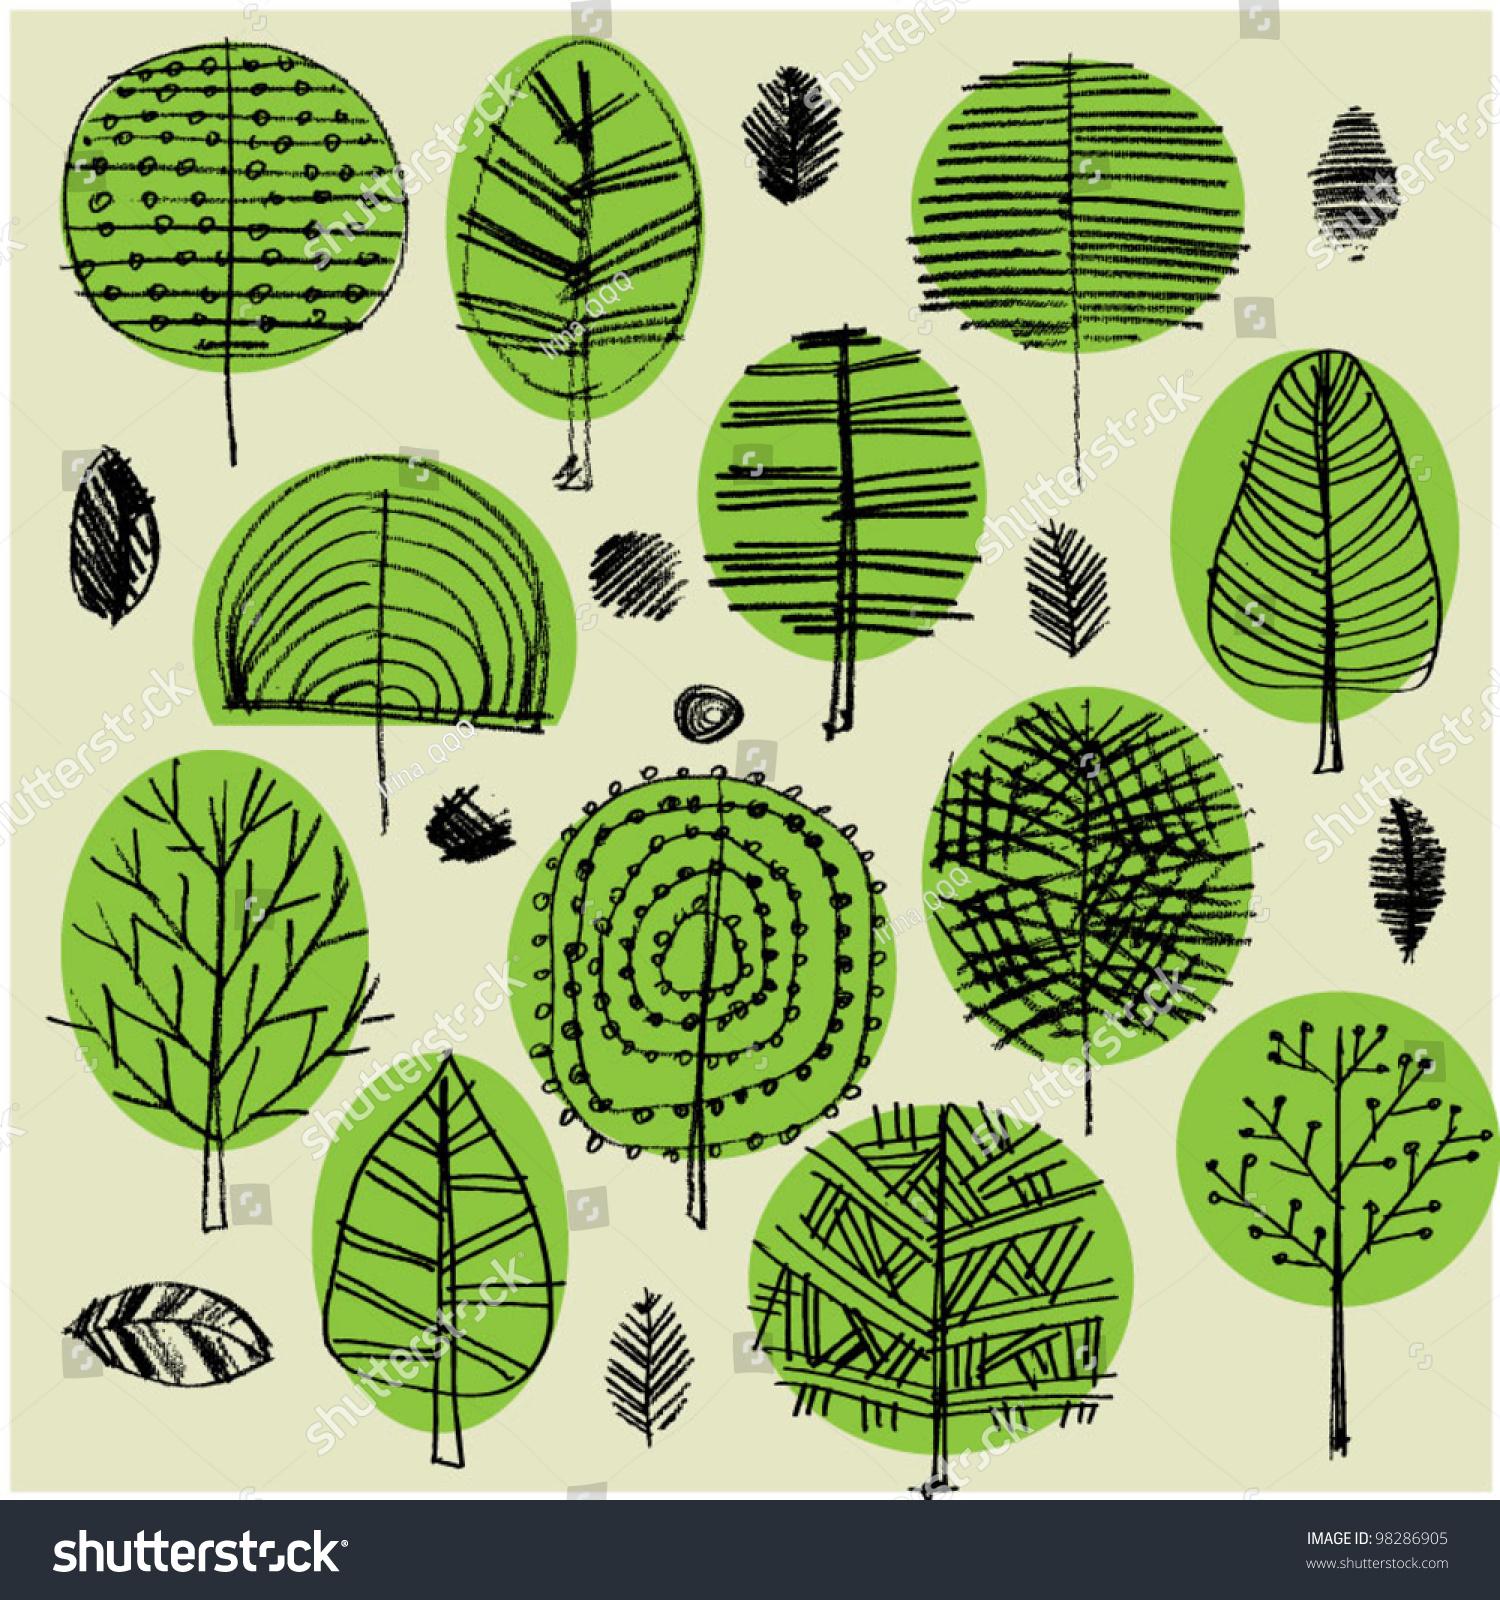 Art Sketching Set Vector Trees Symbols Stock Vector